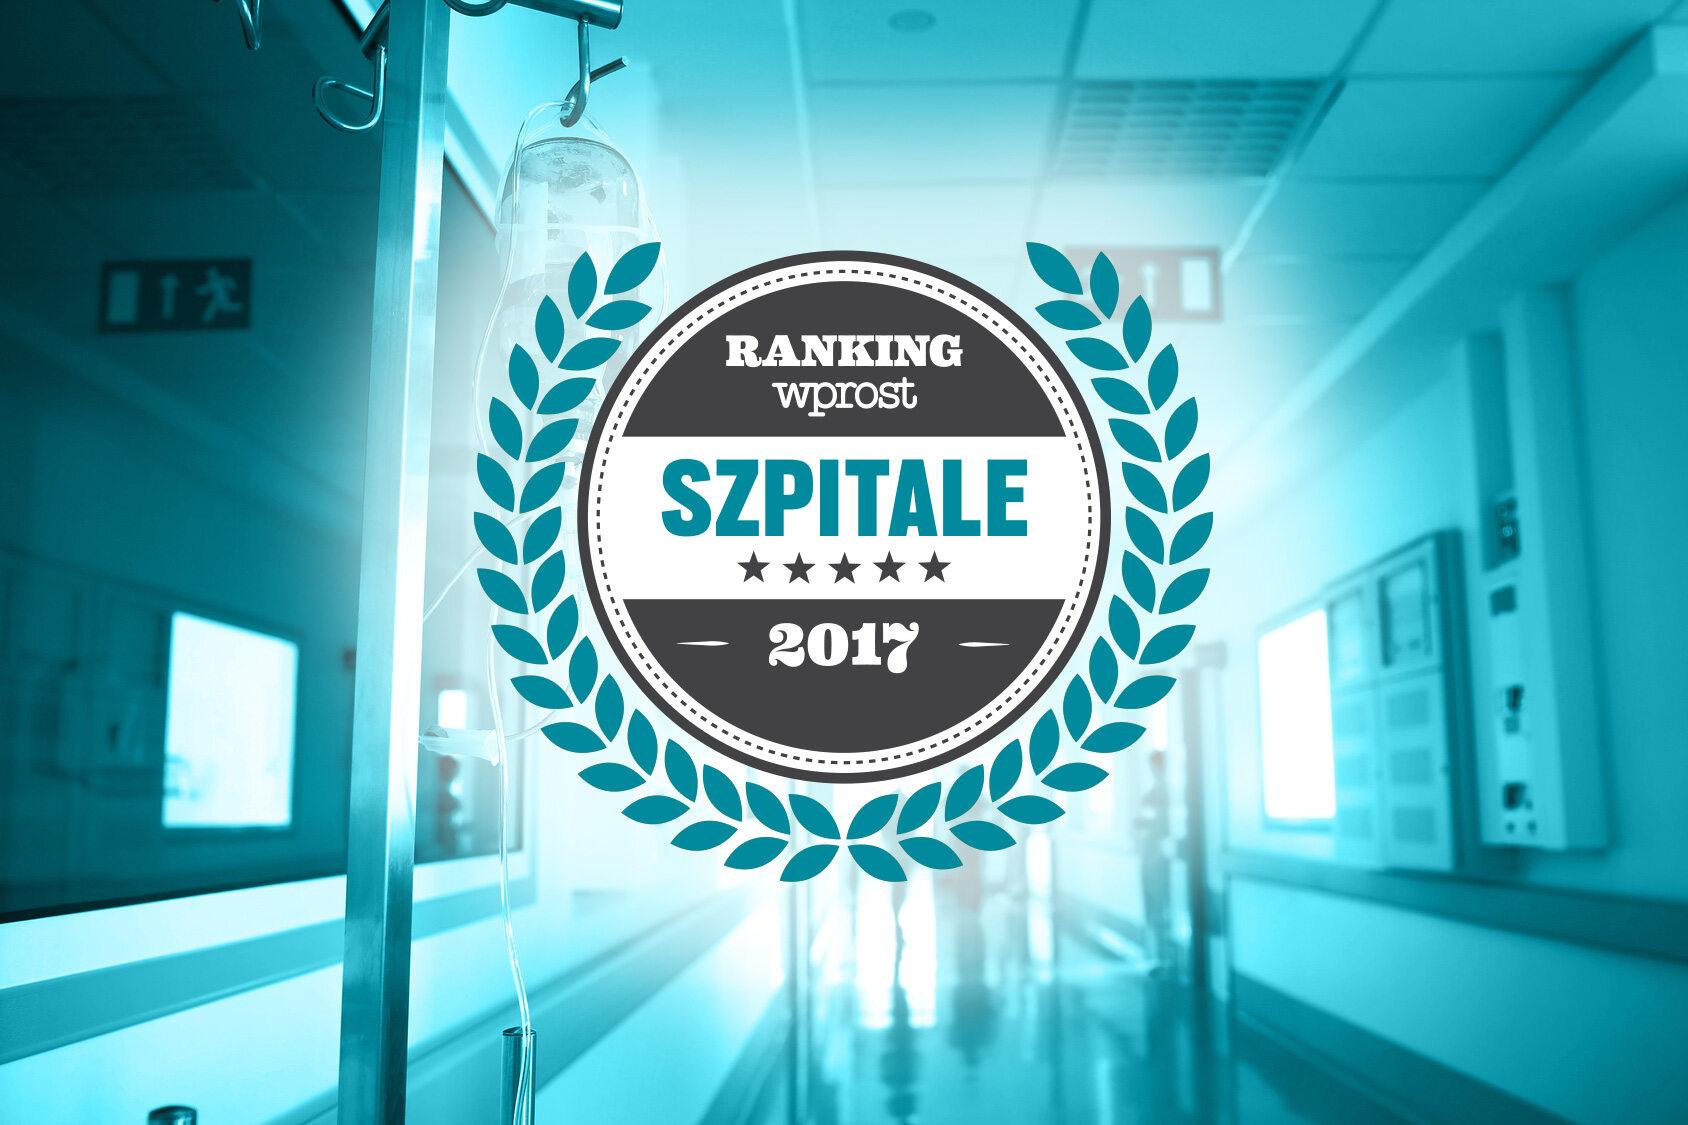 Ranking szpitali Wprost